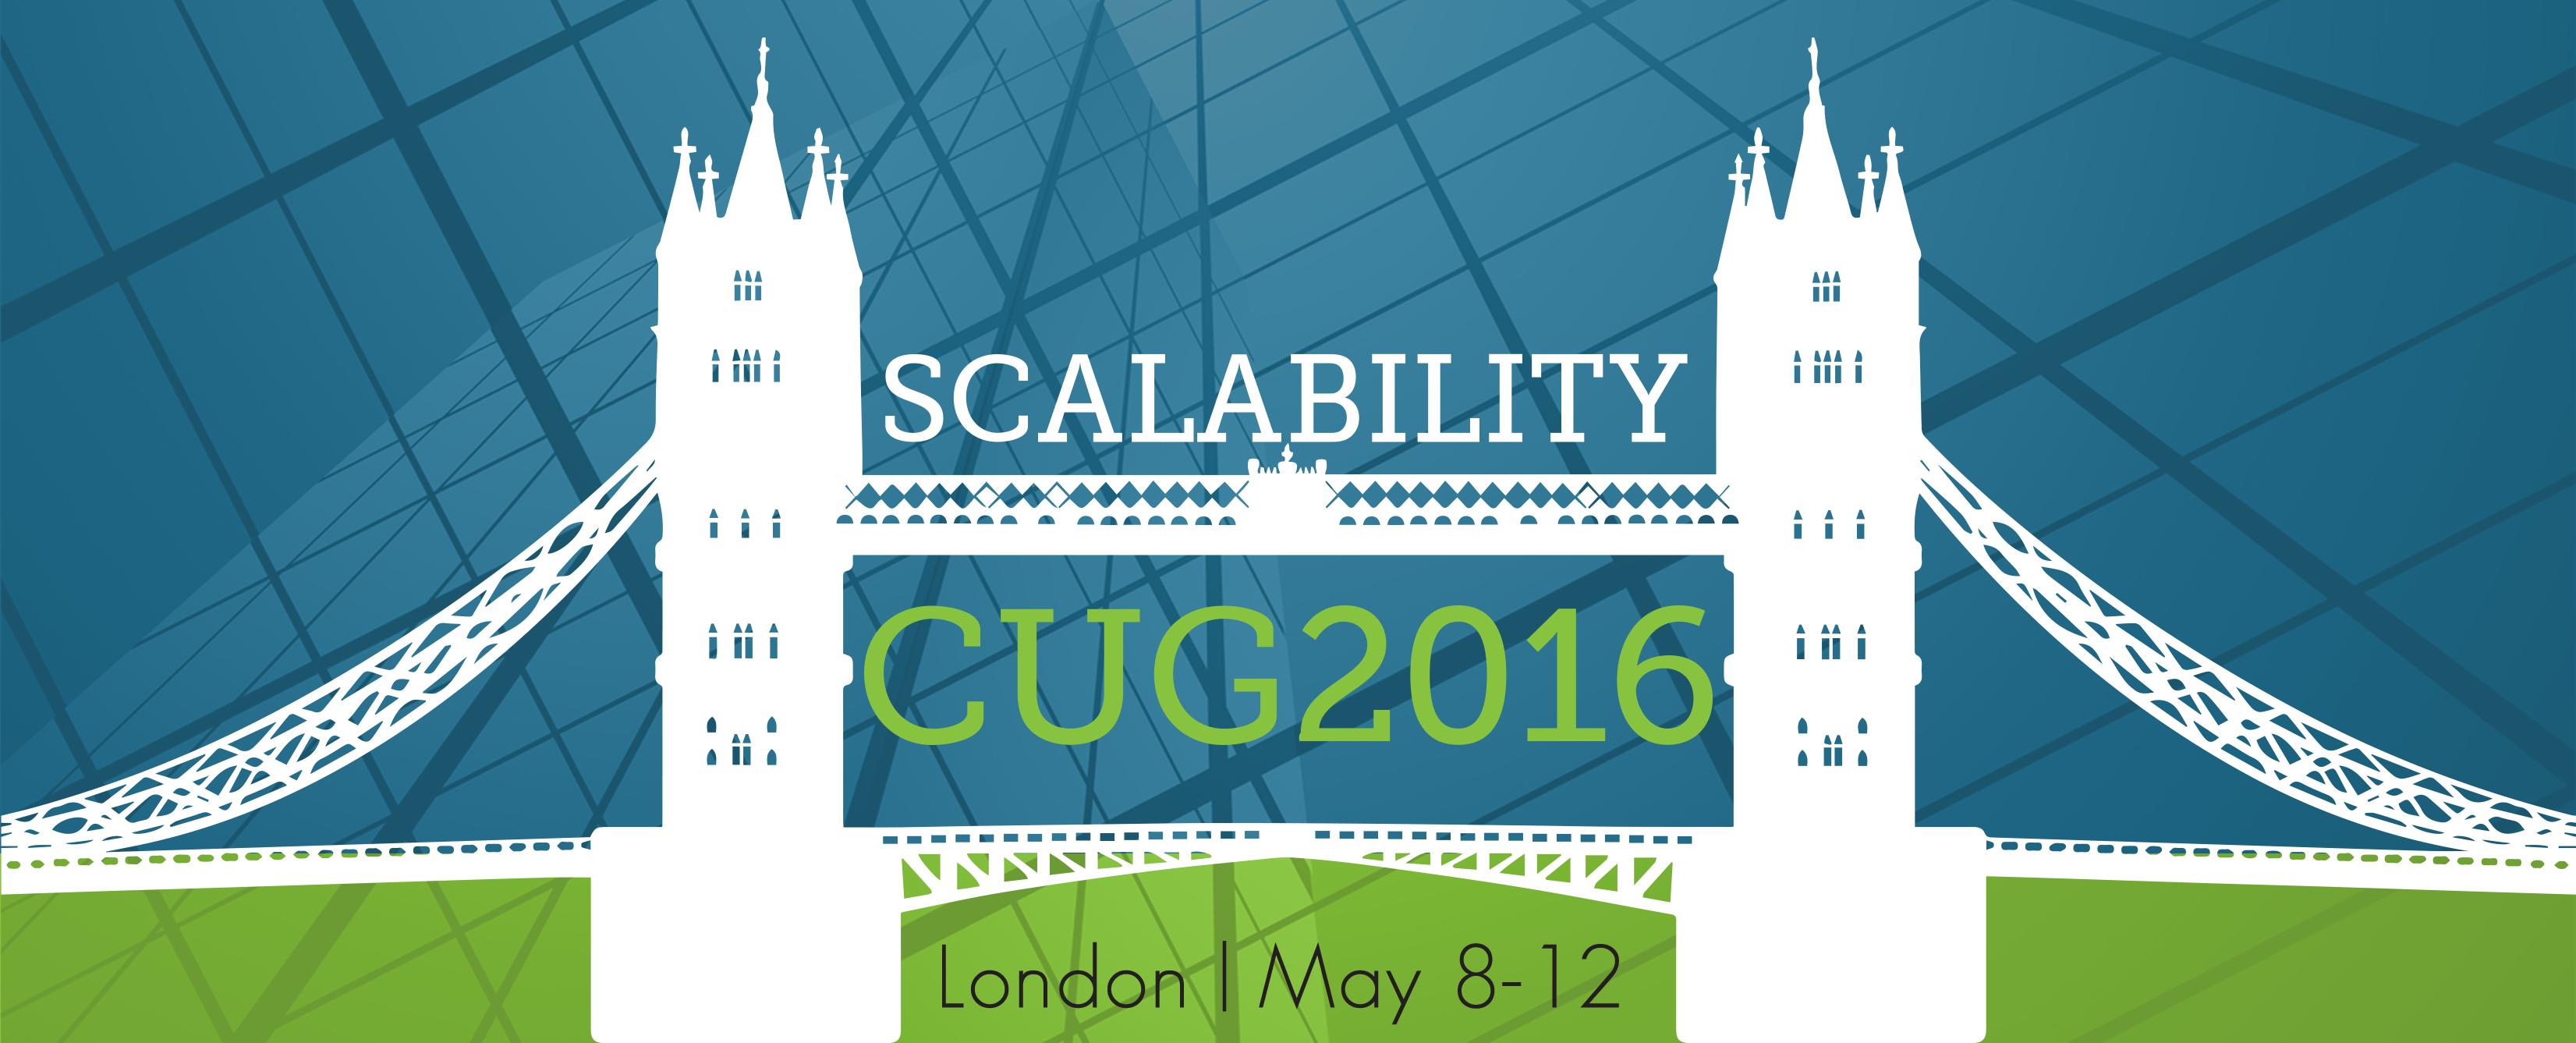 CUG2016 Banner